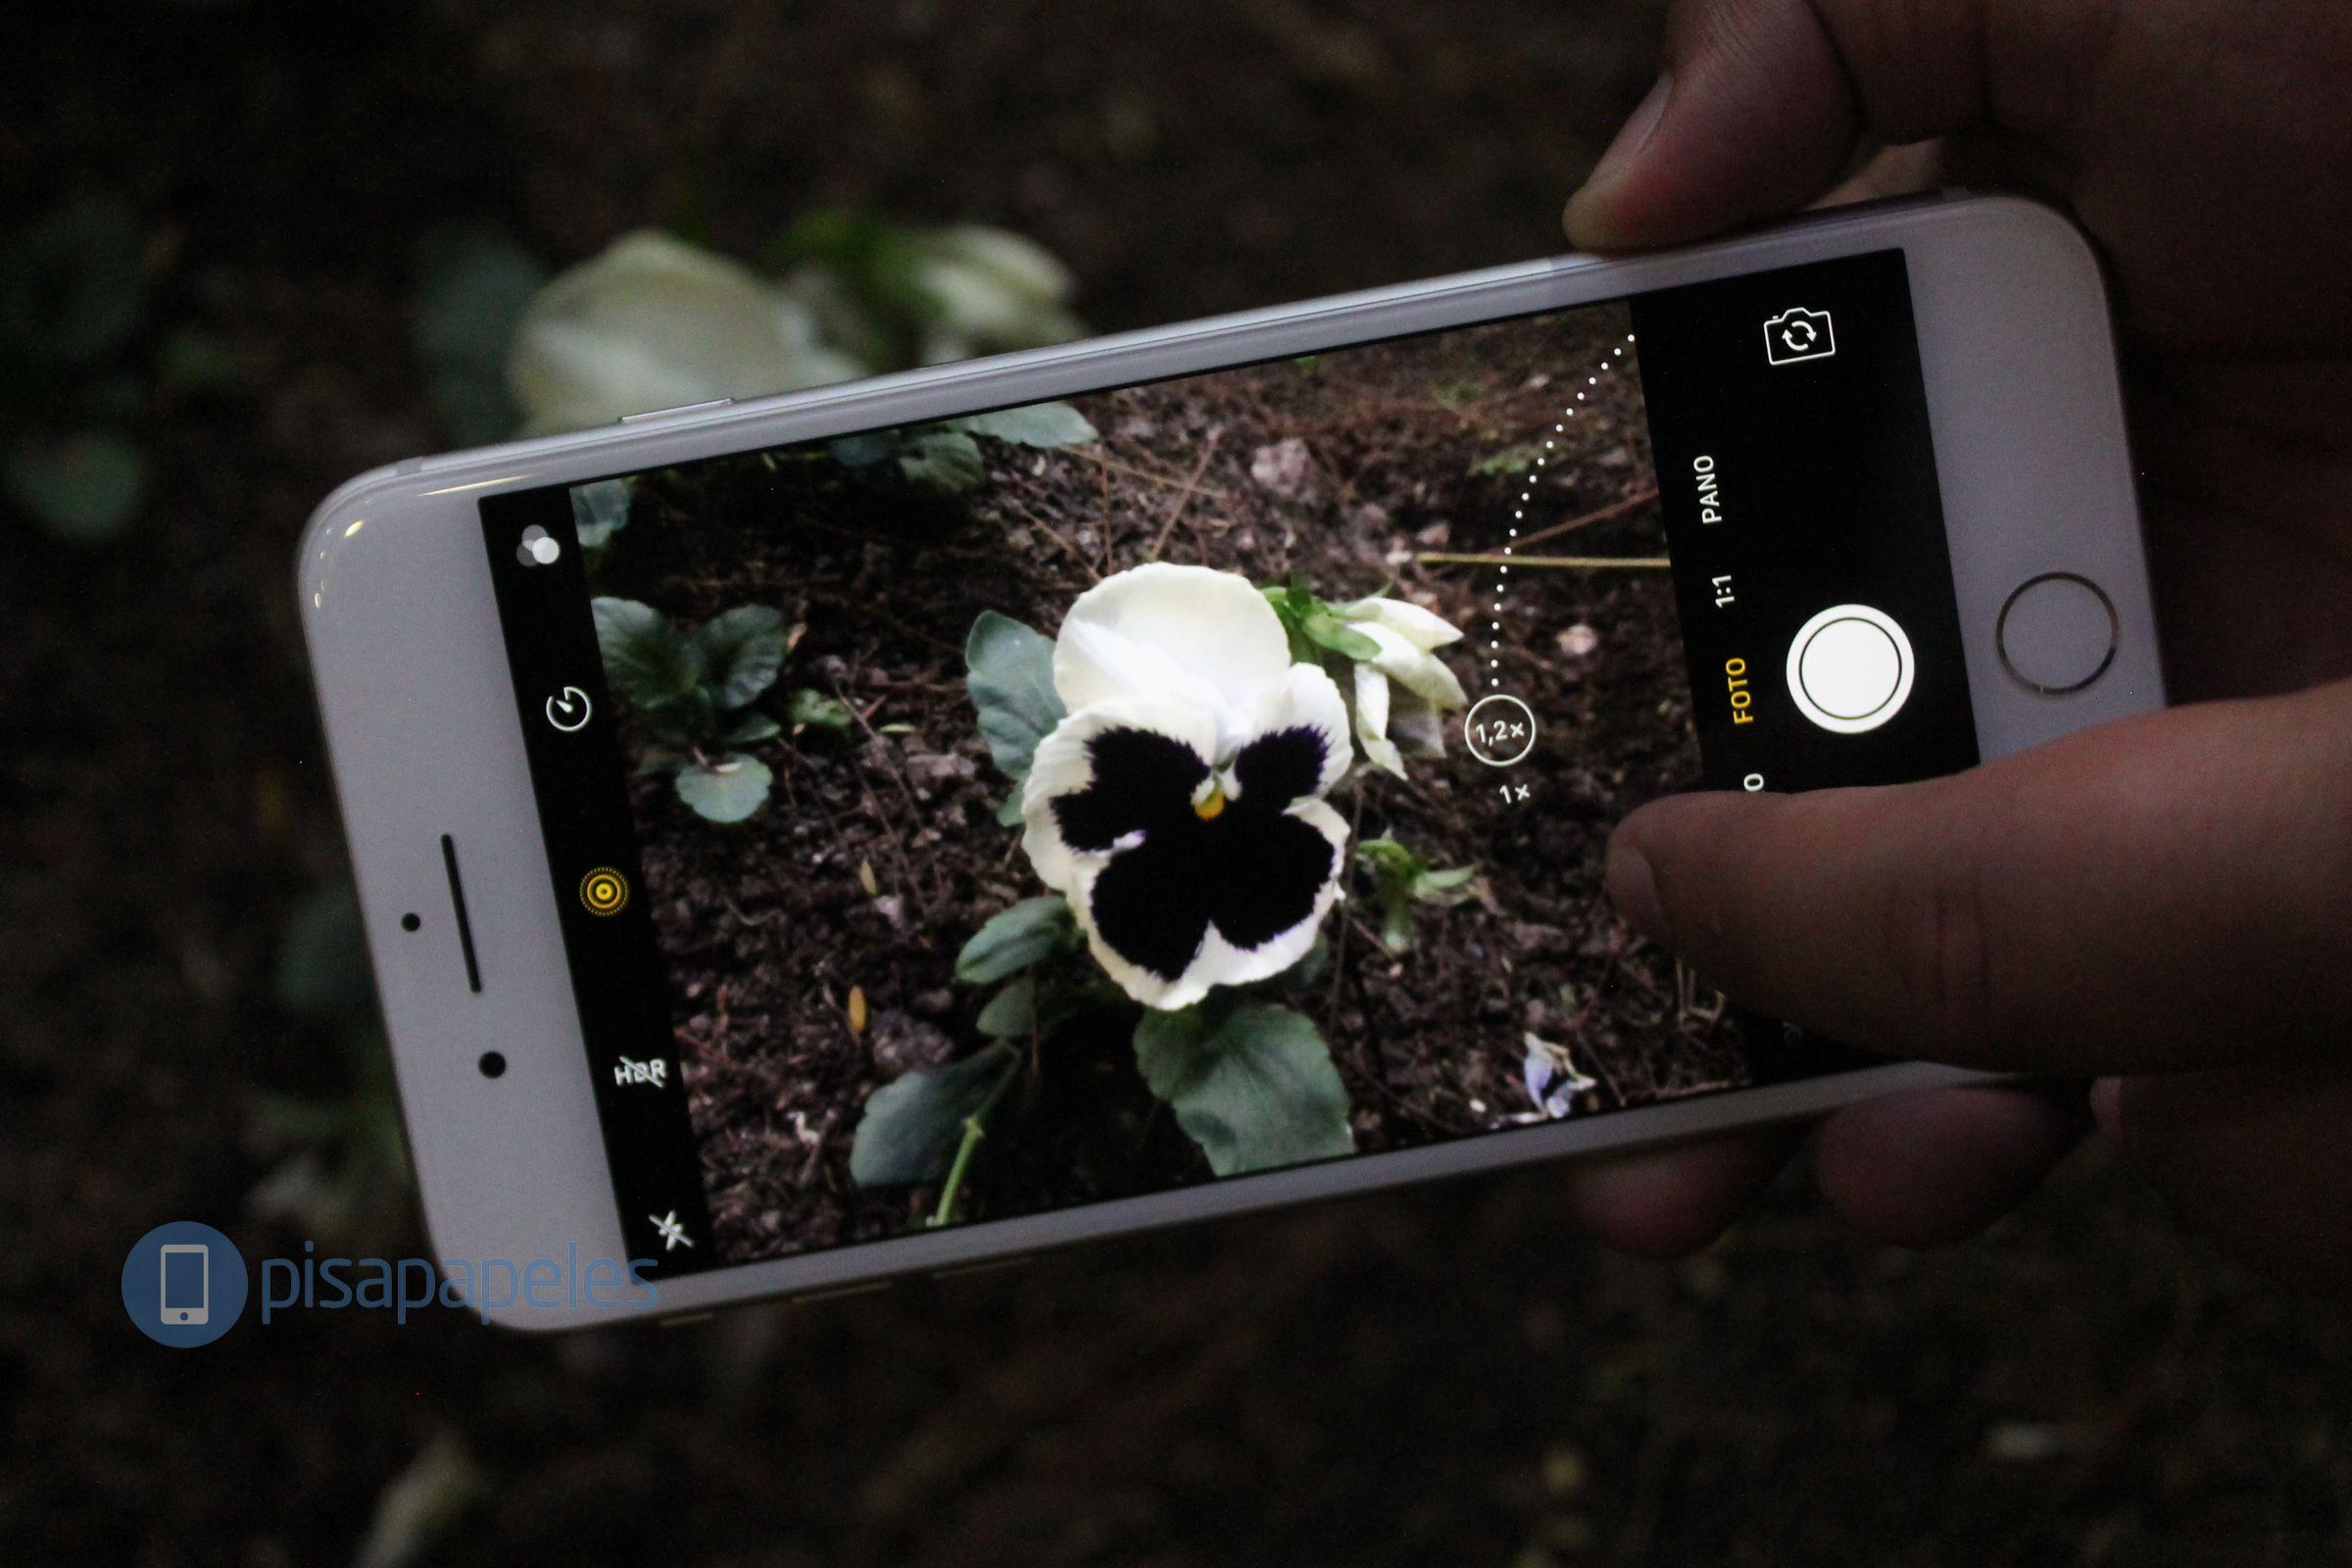 apple-iphone-7-plus-pisapapeles-net_3